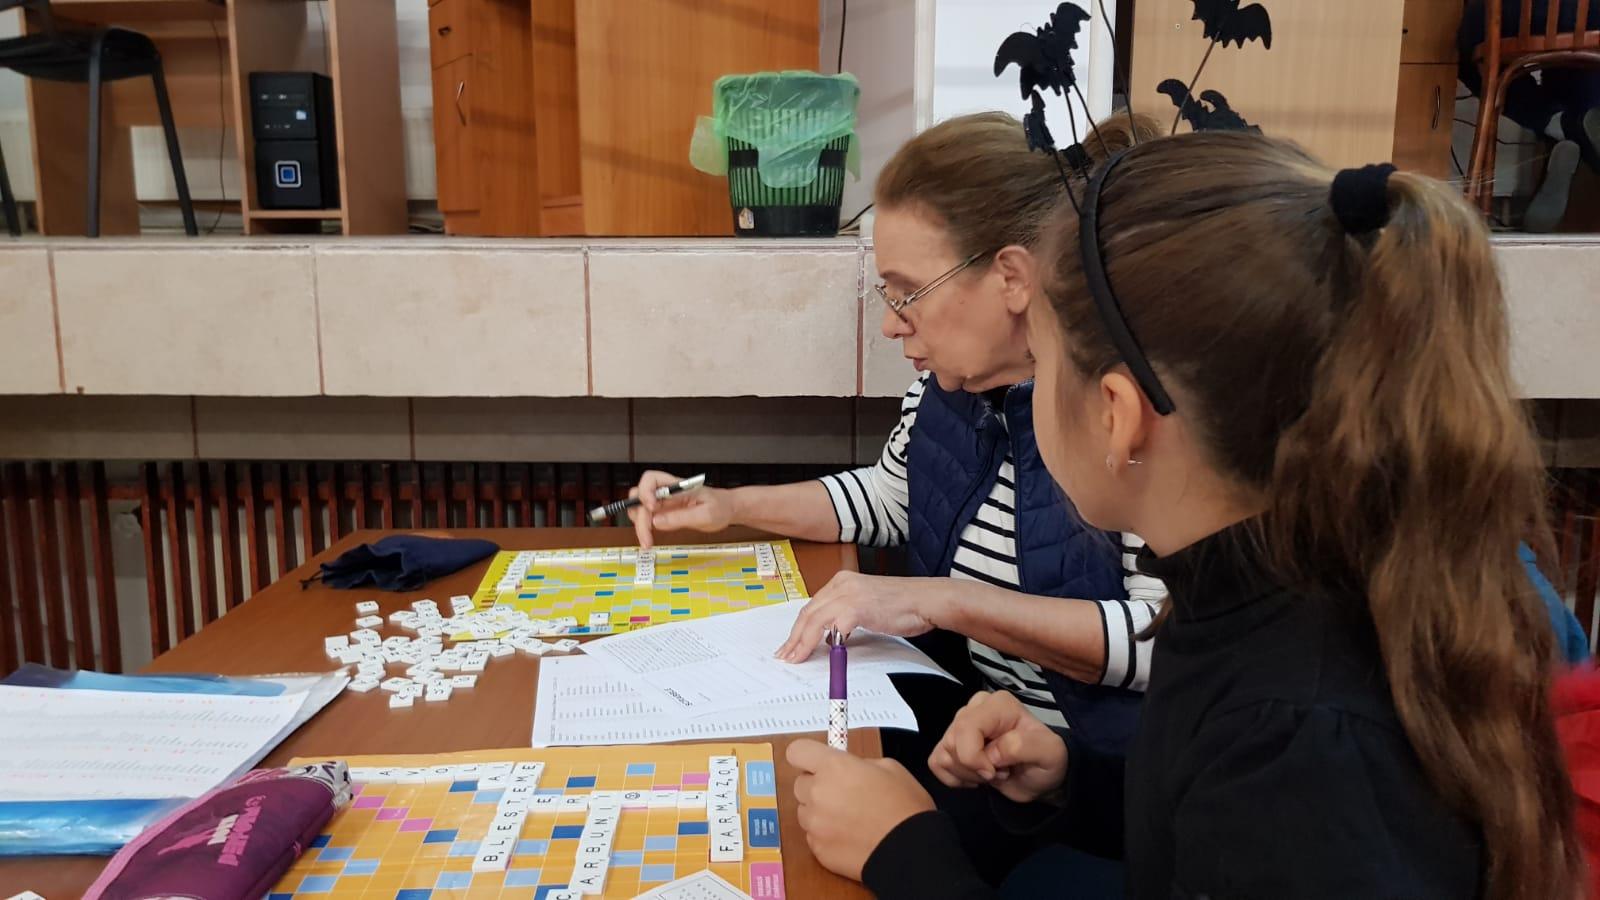 Jocul de Scrabble prinde Viata